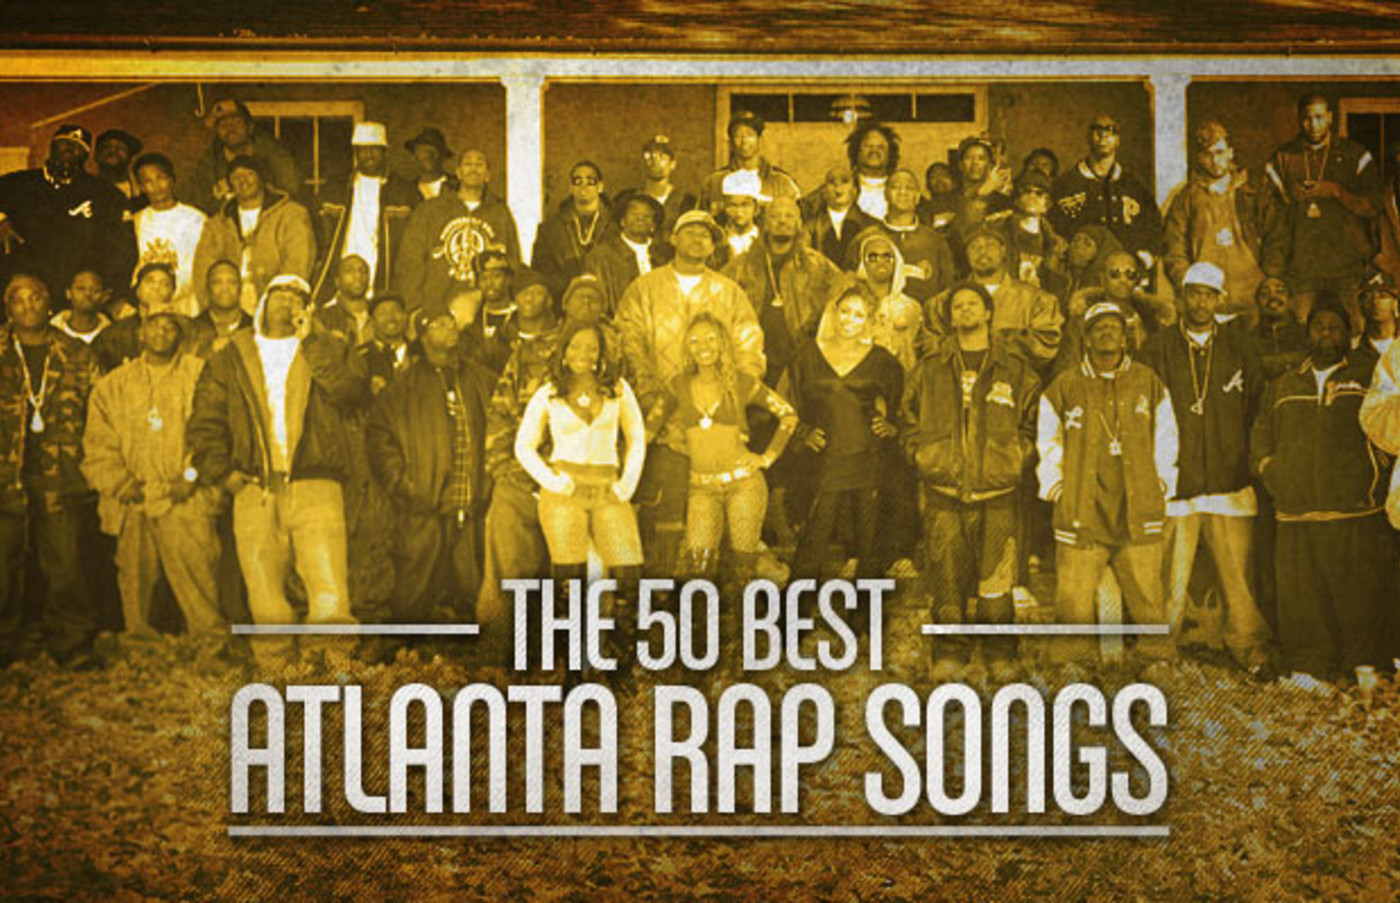 The 50 Best Atlanta Rap Songs